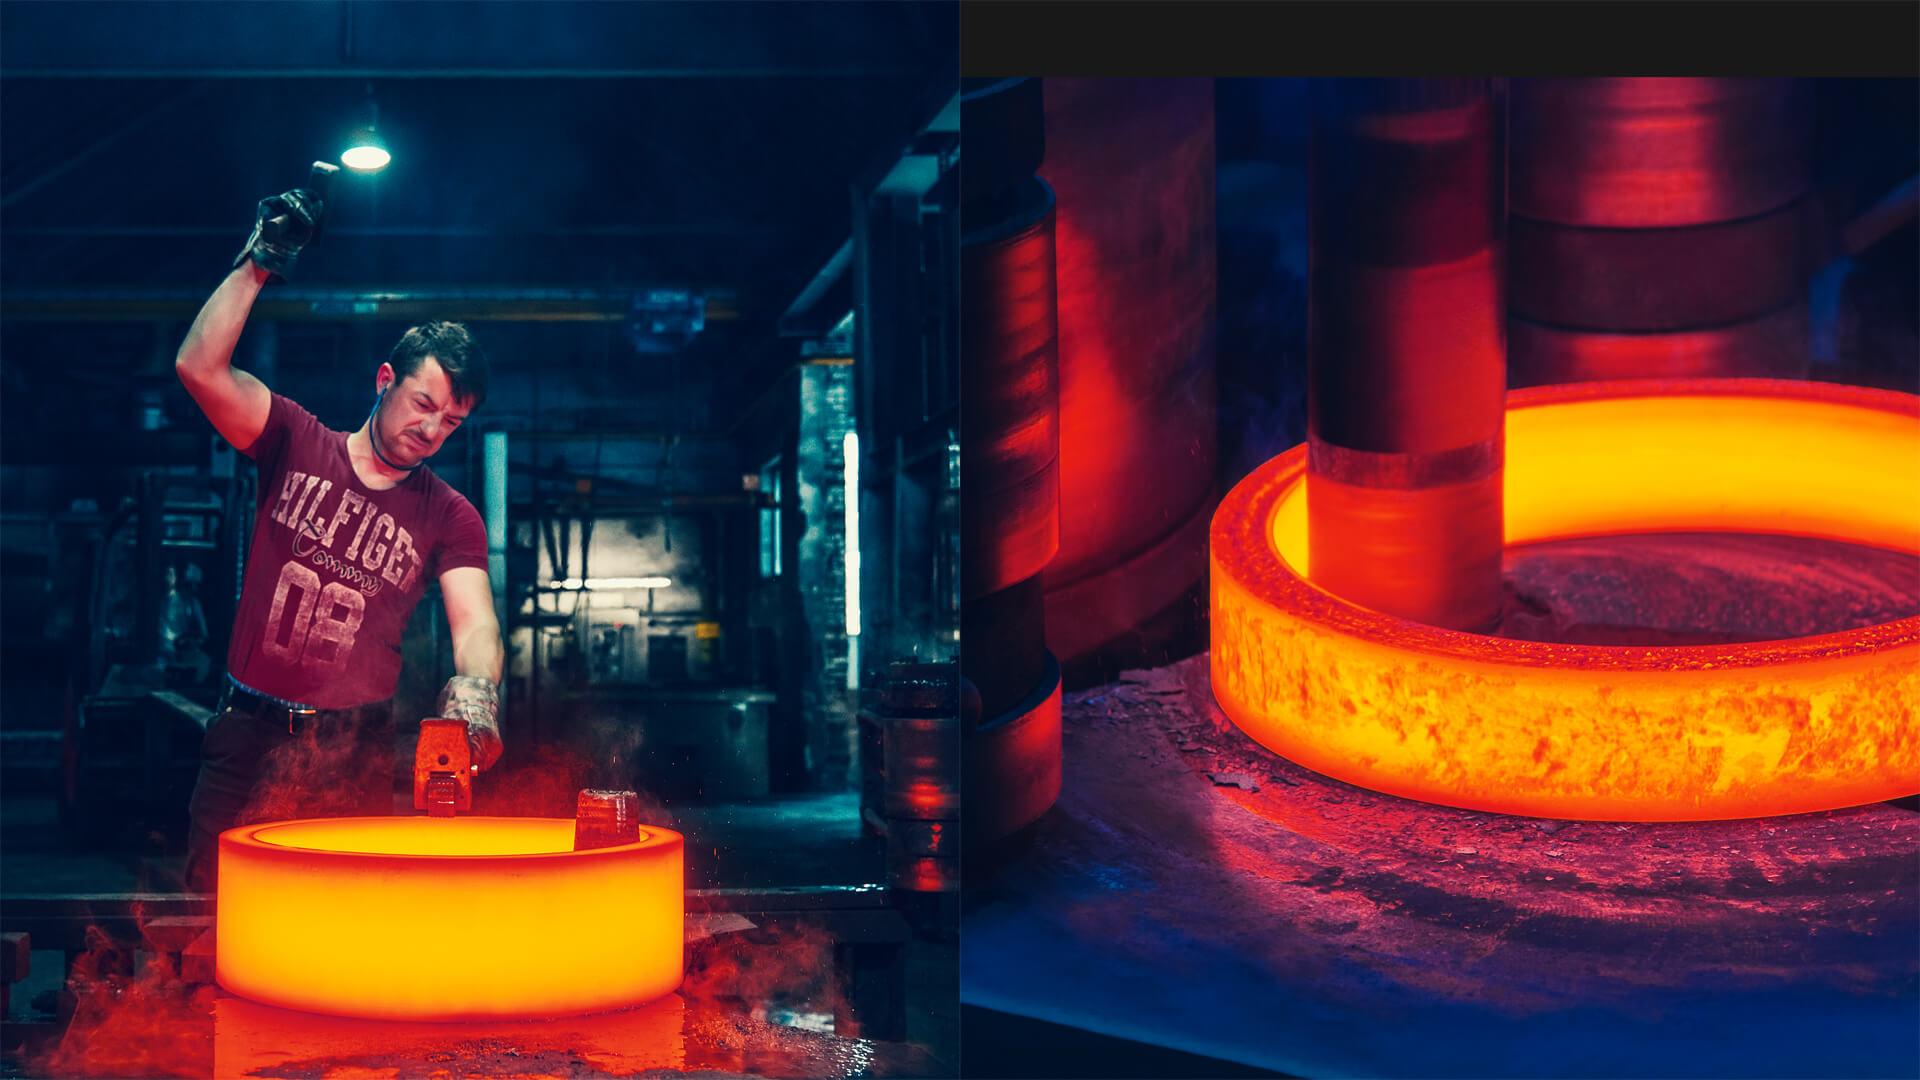 Schmiede-Technik - Stahlbearbeitung - Vergütung und Formgebung - 80 Jahre Erfahrung - Leppe Edelstahl | Chr. Höver & Sohn GmbH & Co. KG - Lindlar